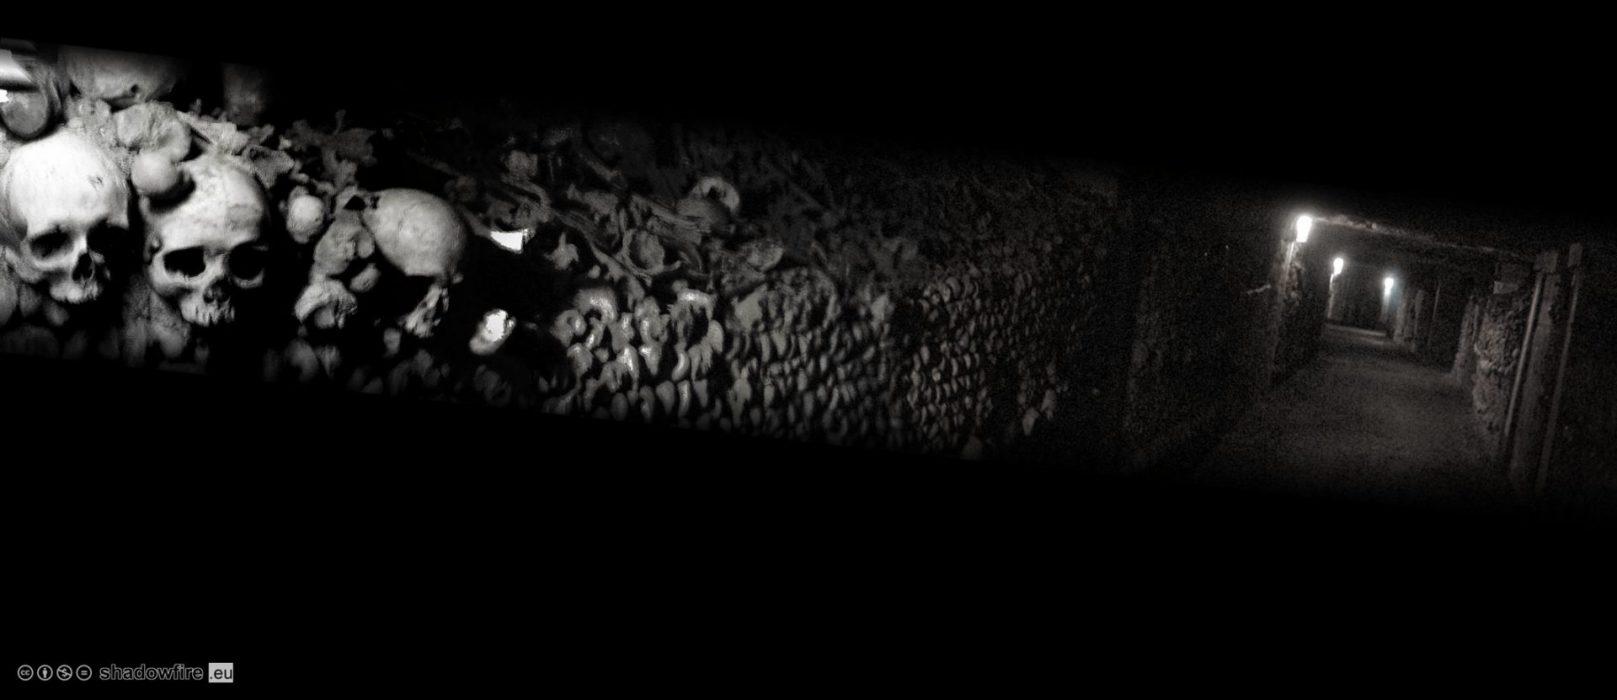 France, Paris, Catacombes